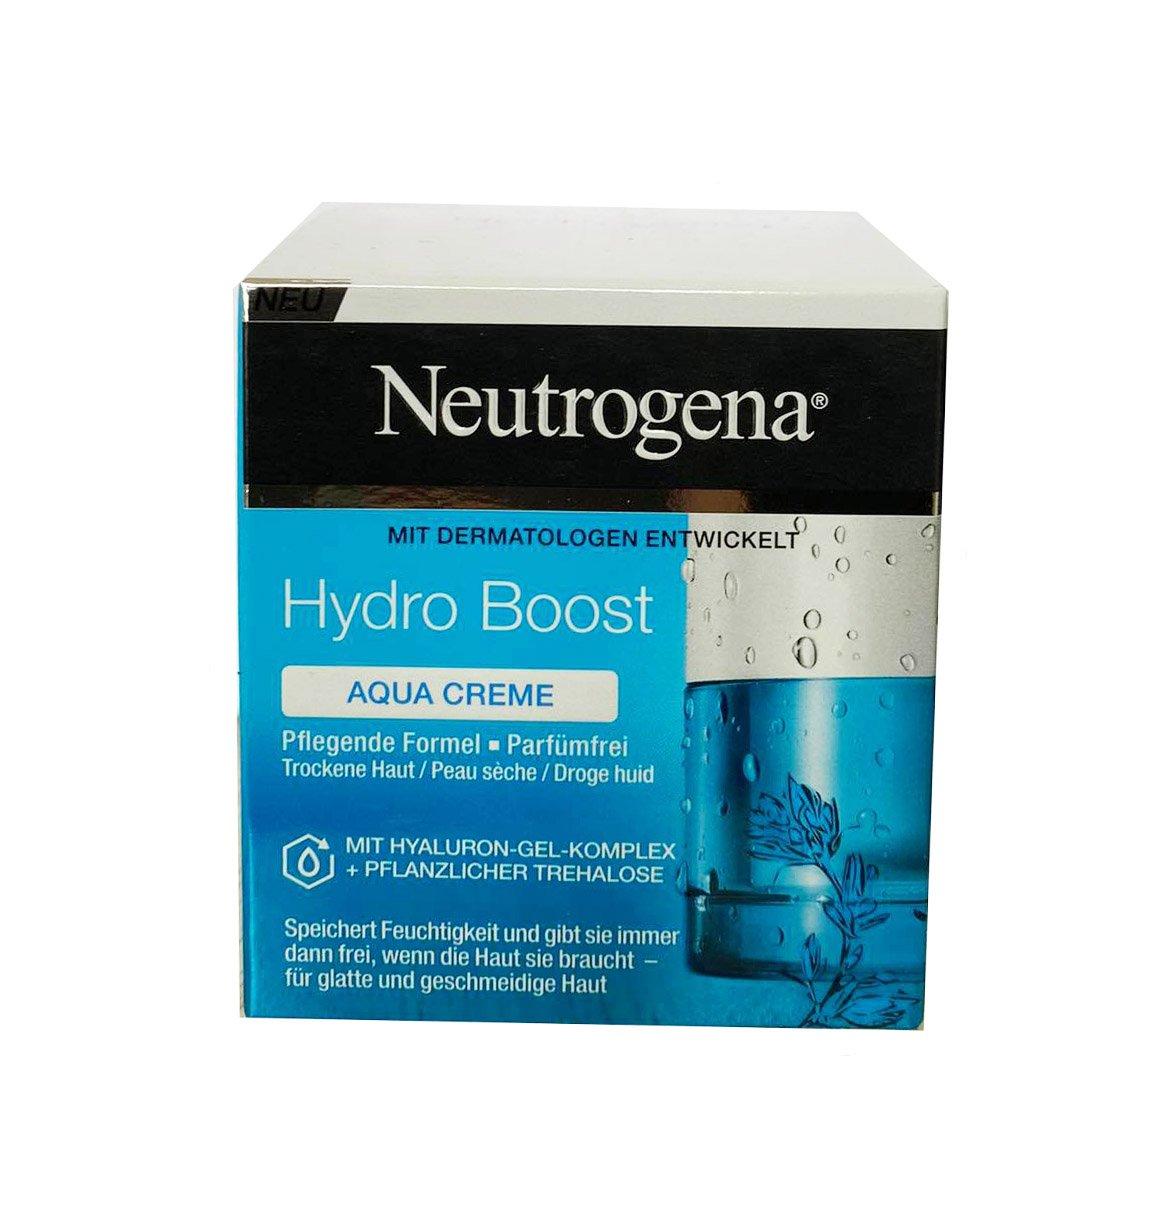 Neutrogena hydro boost aqua Cream cho da khô (bản Đức)